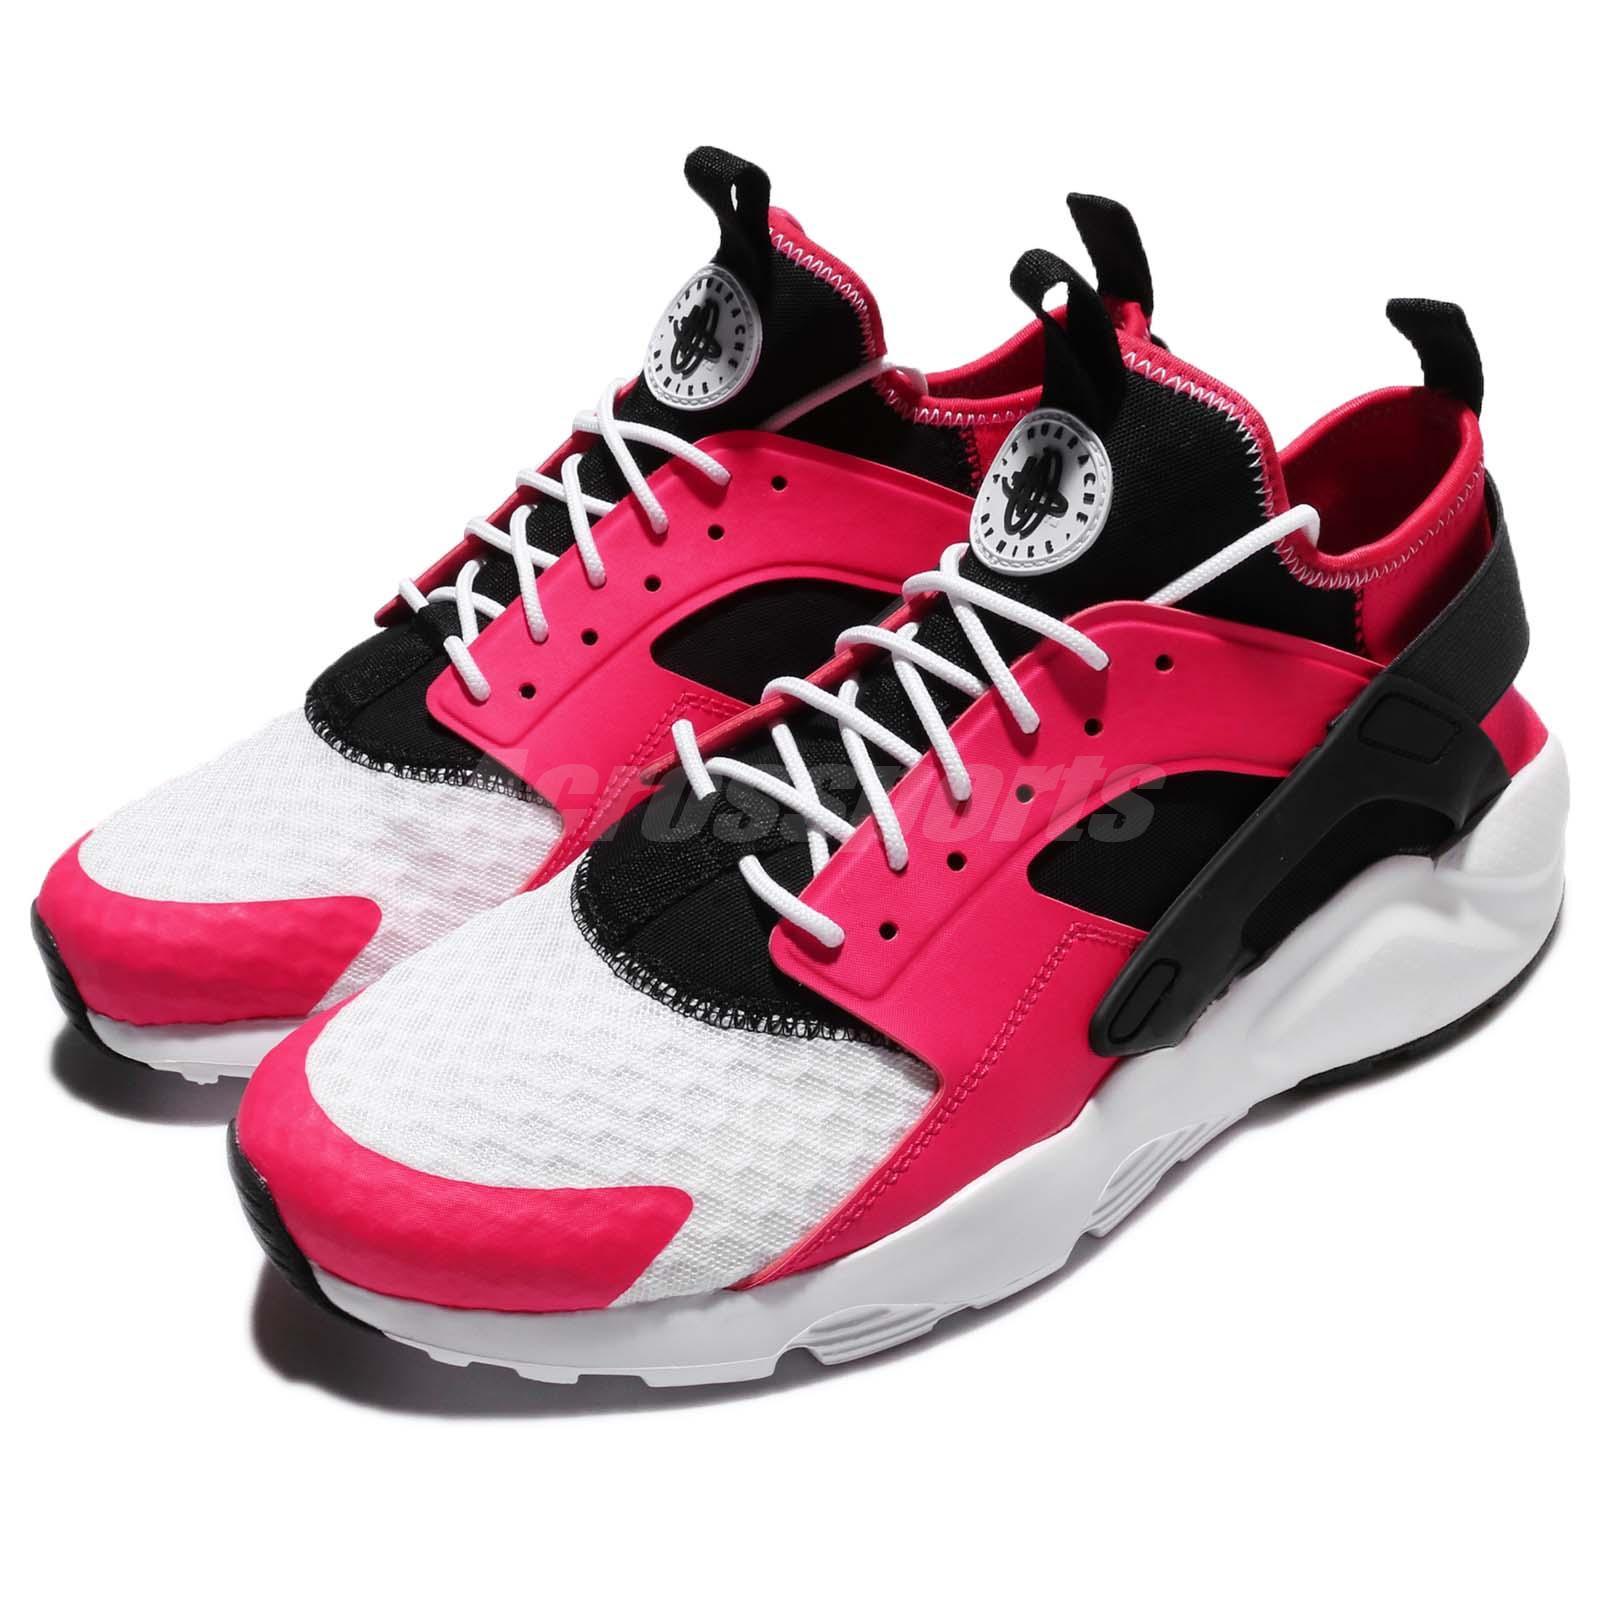 c24f5883ab80 Details about Nike Air Huarache Run Ultra Siren Red Black White Men Shoes  Sneaker 819685-603